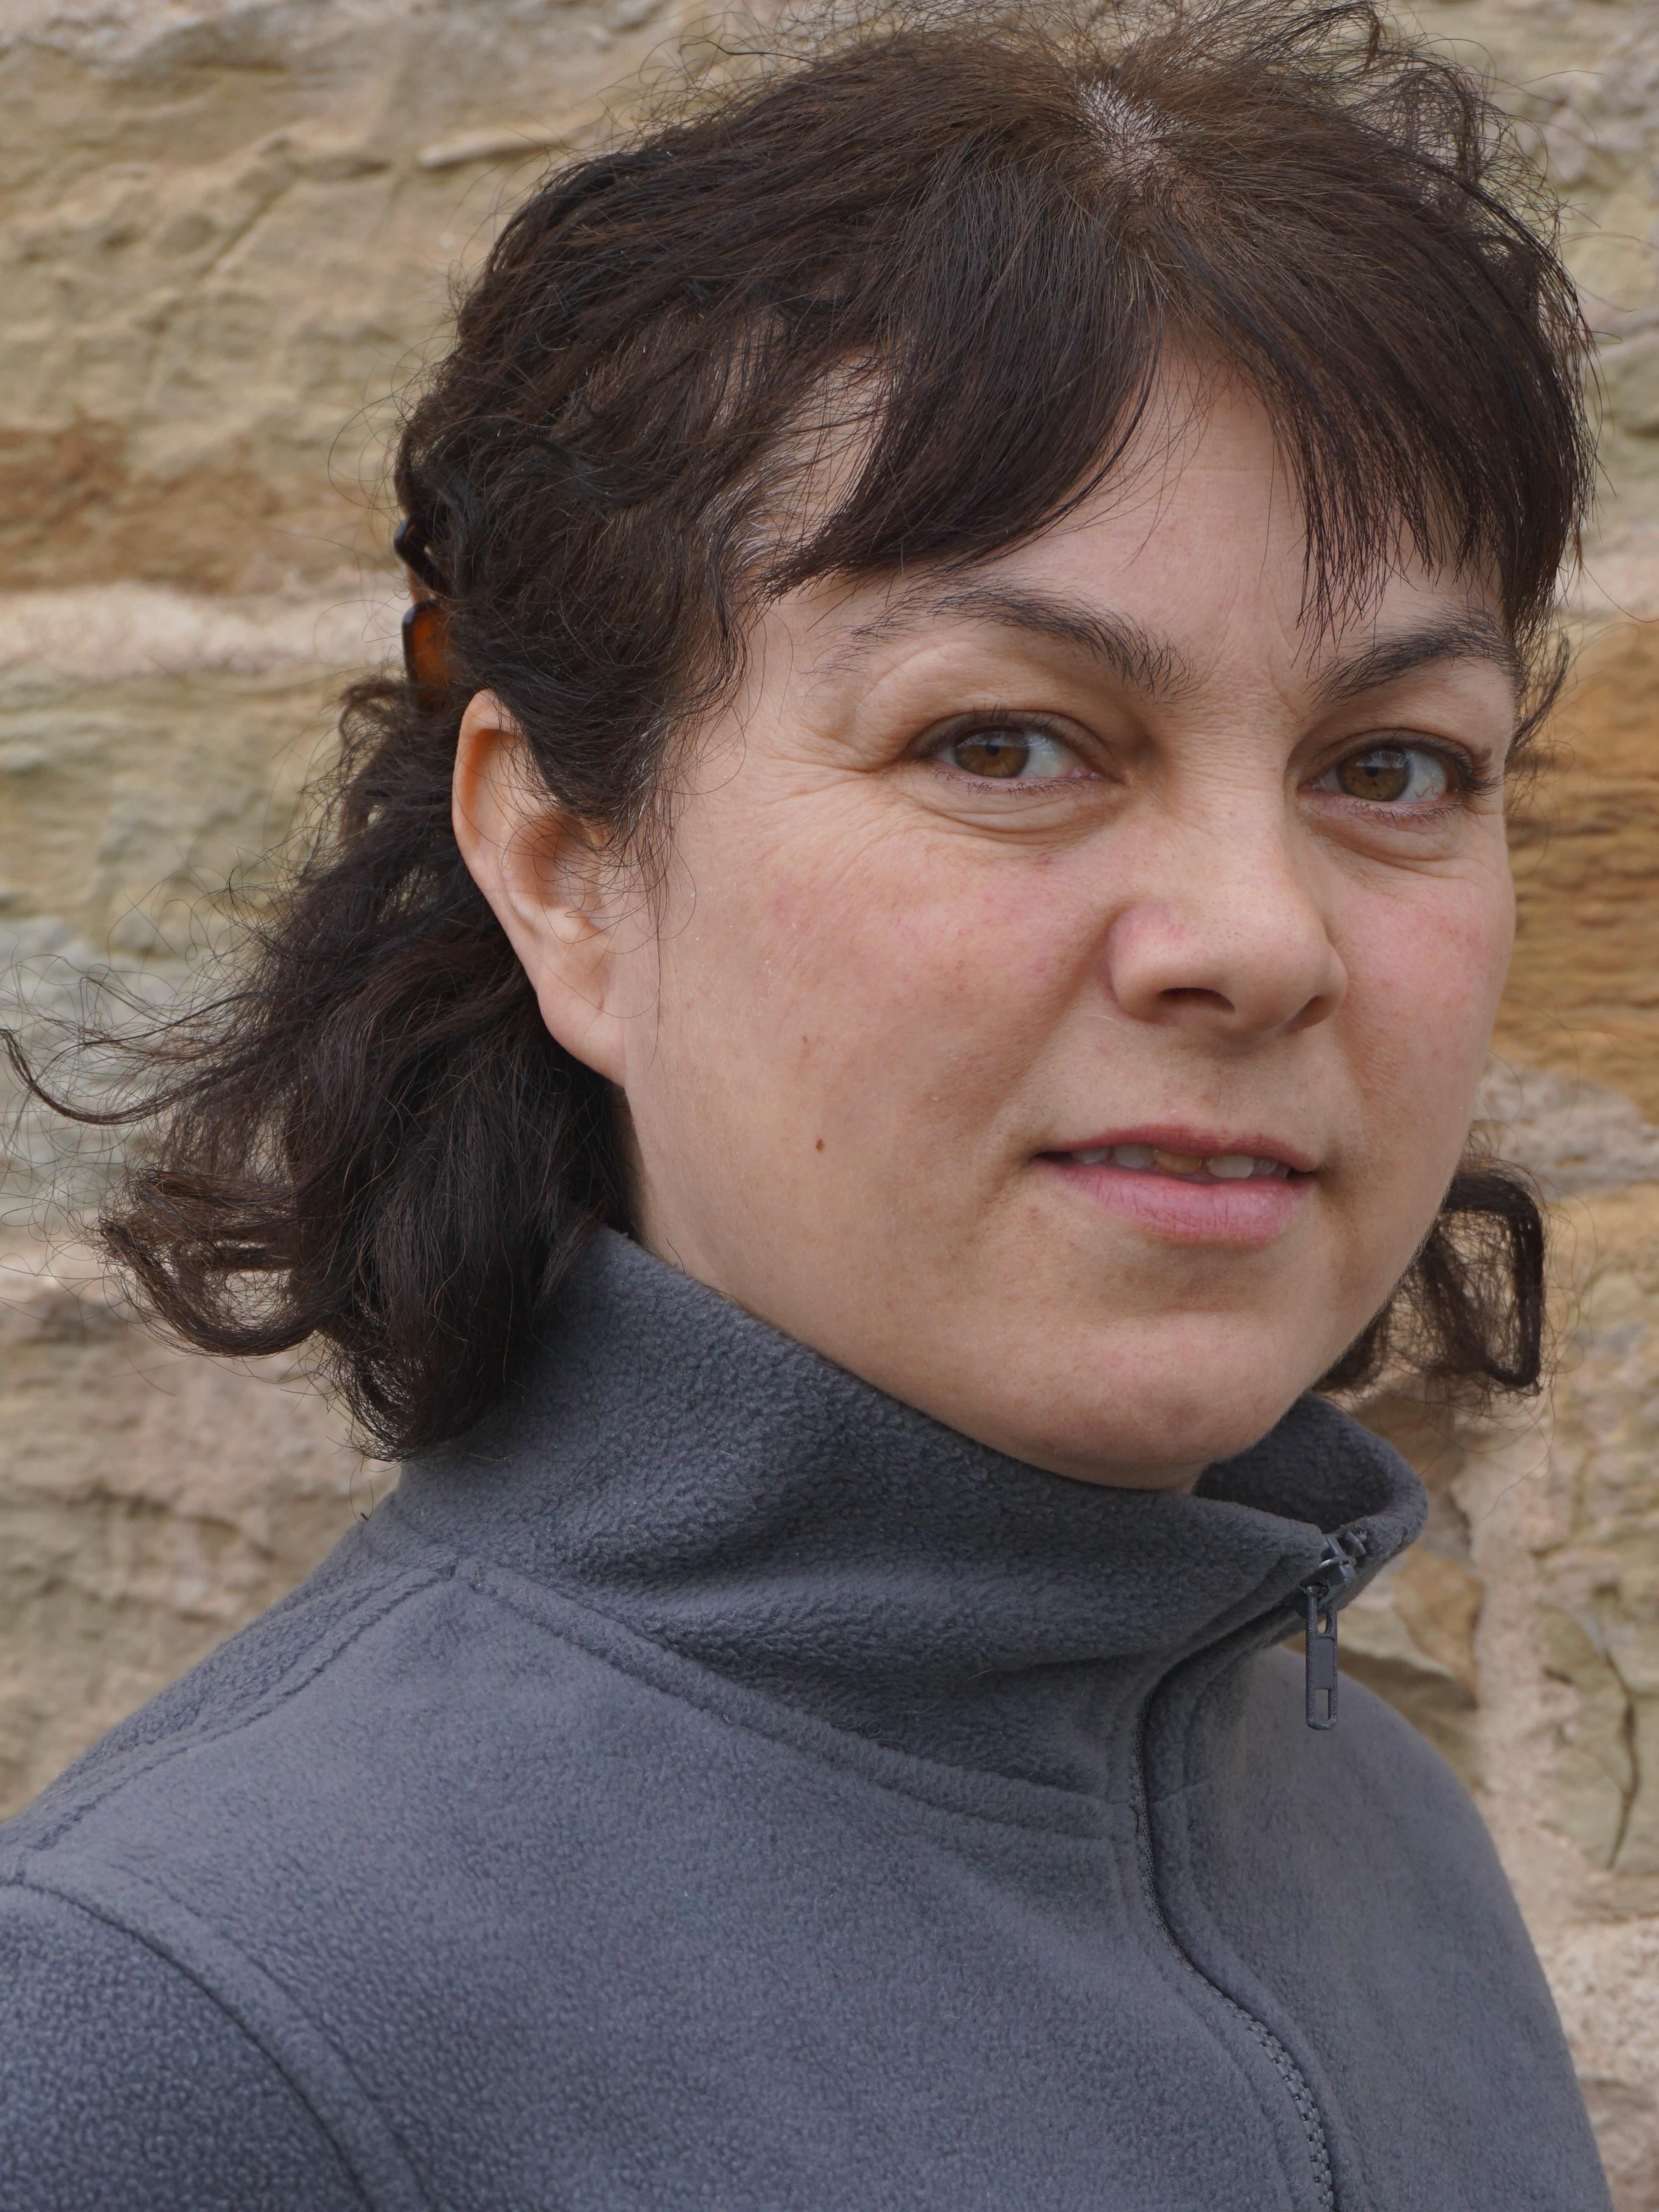 Lian Noriega-Waite